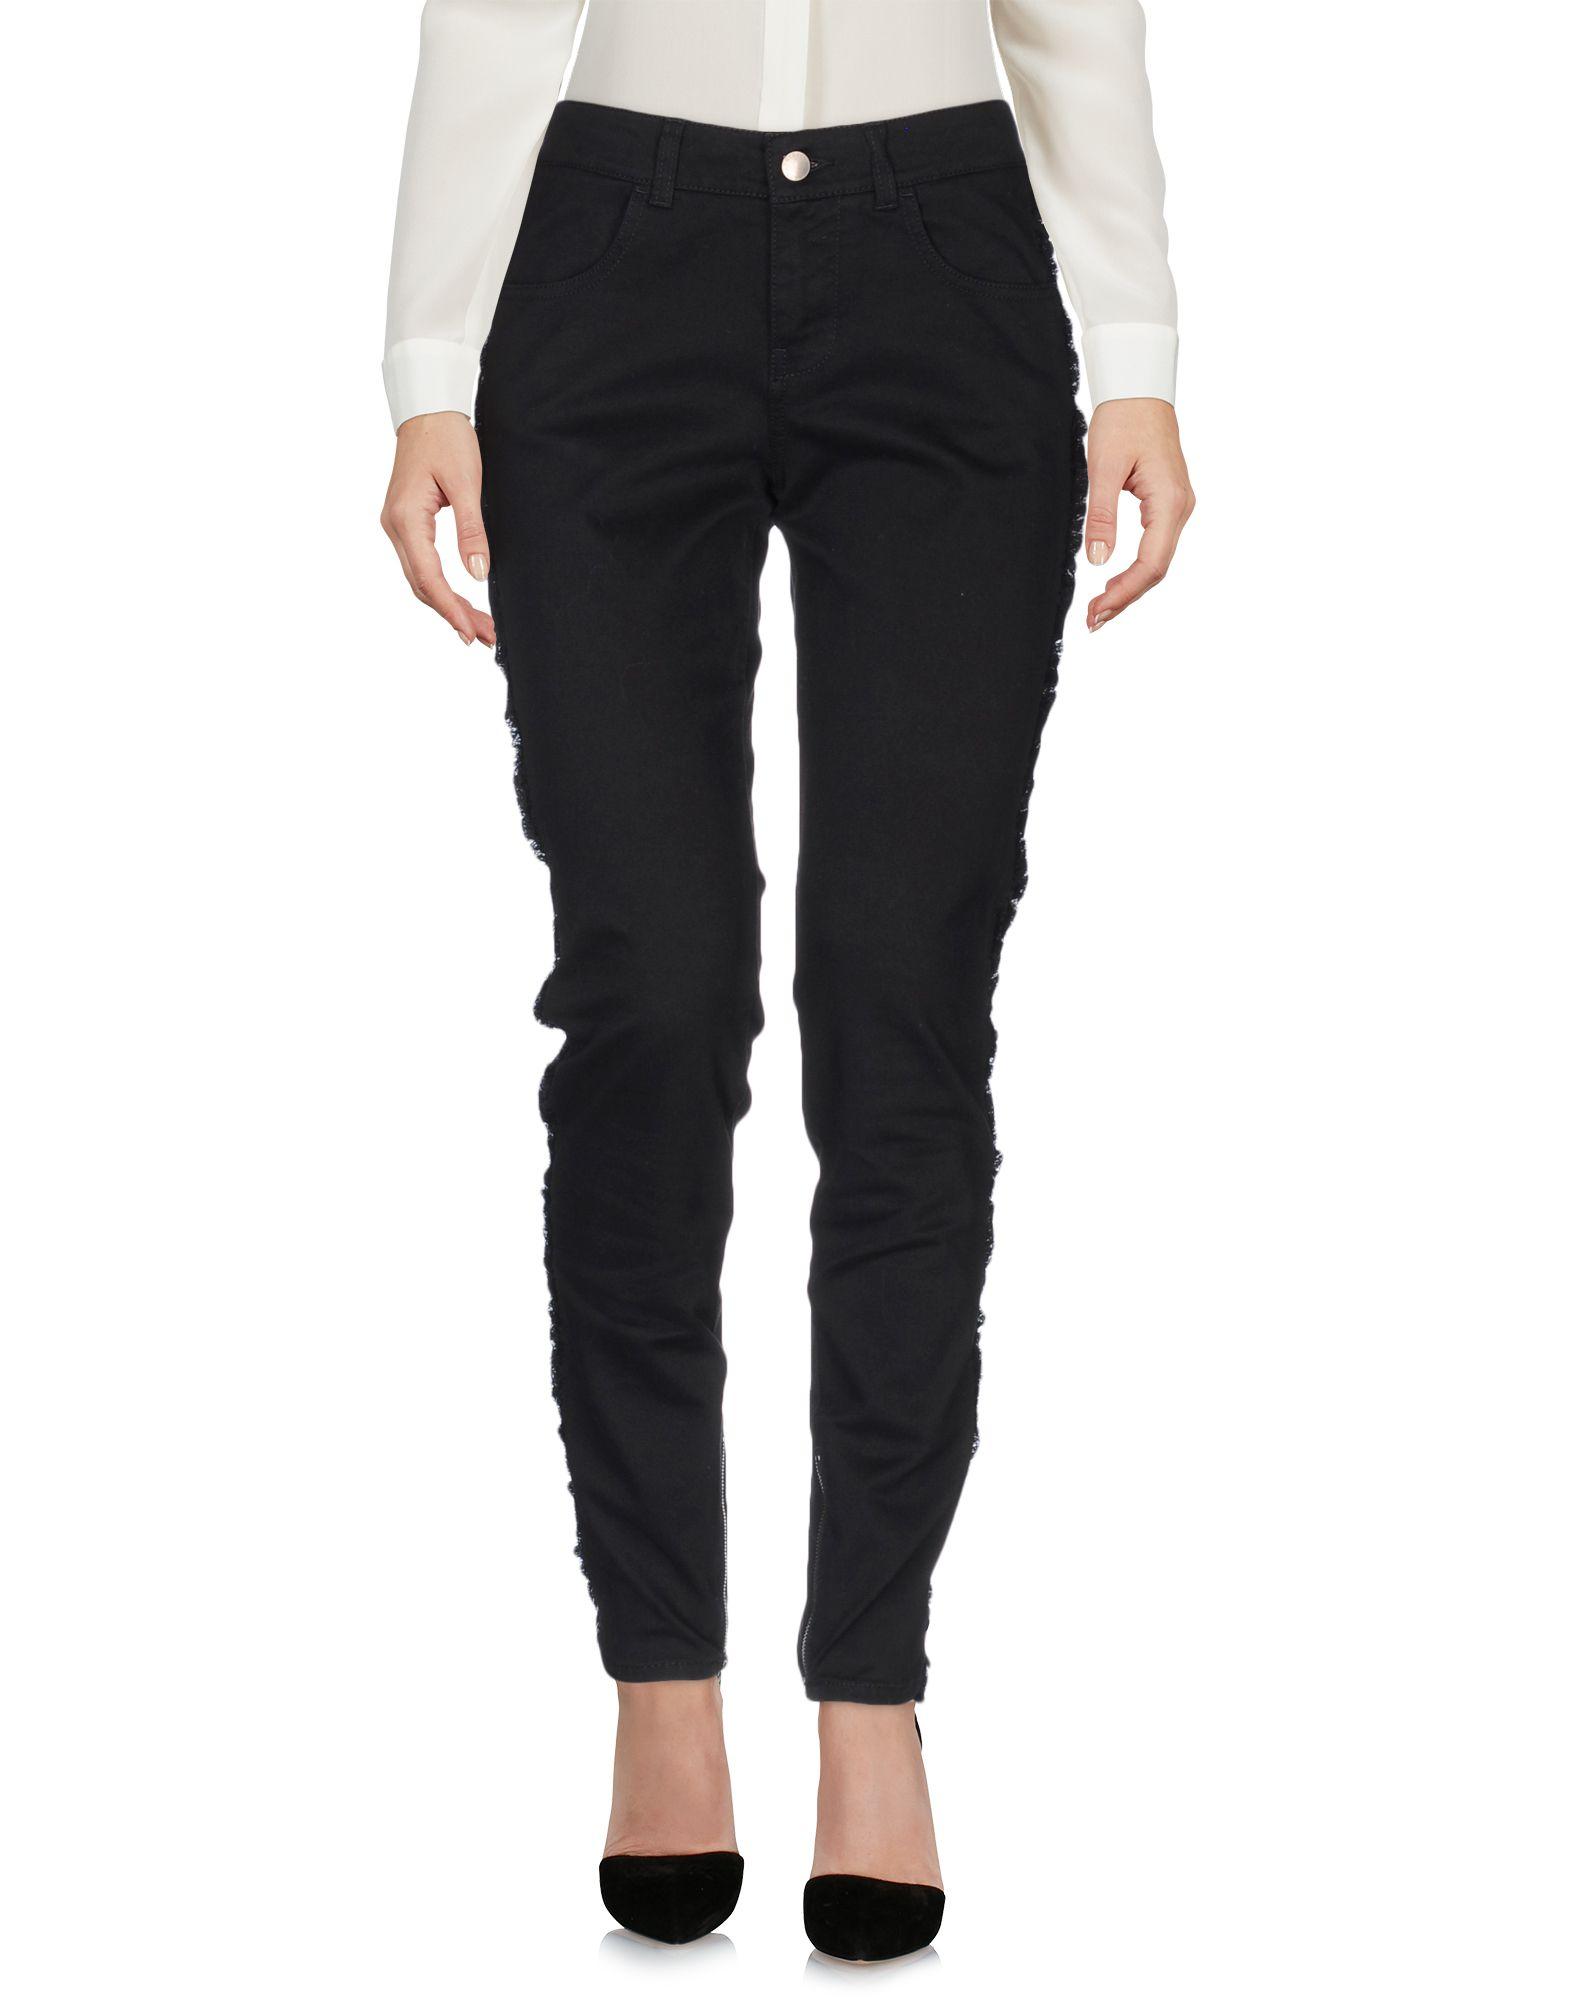 Pantalone Stella Mccartney Donna - Acquista online su 8hJlQ